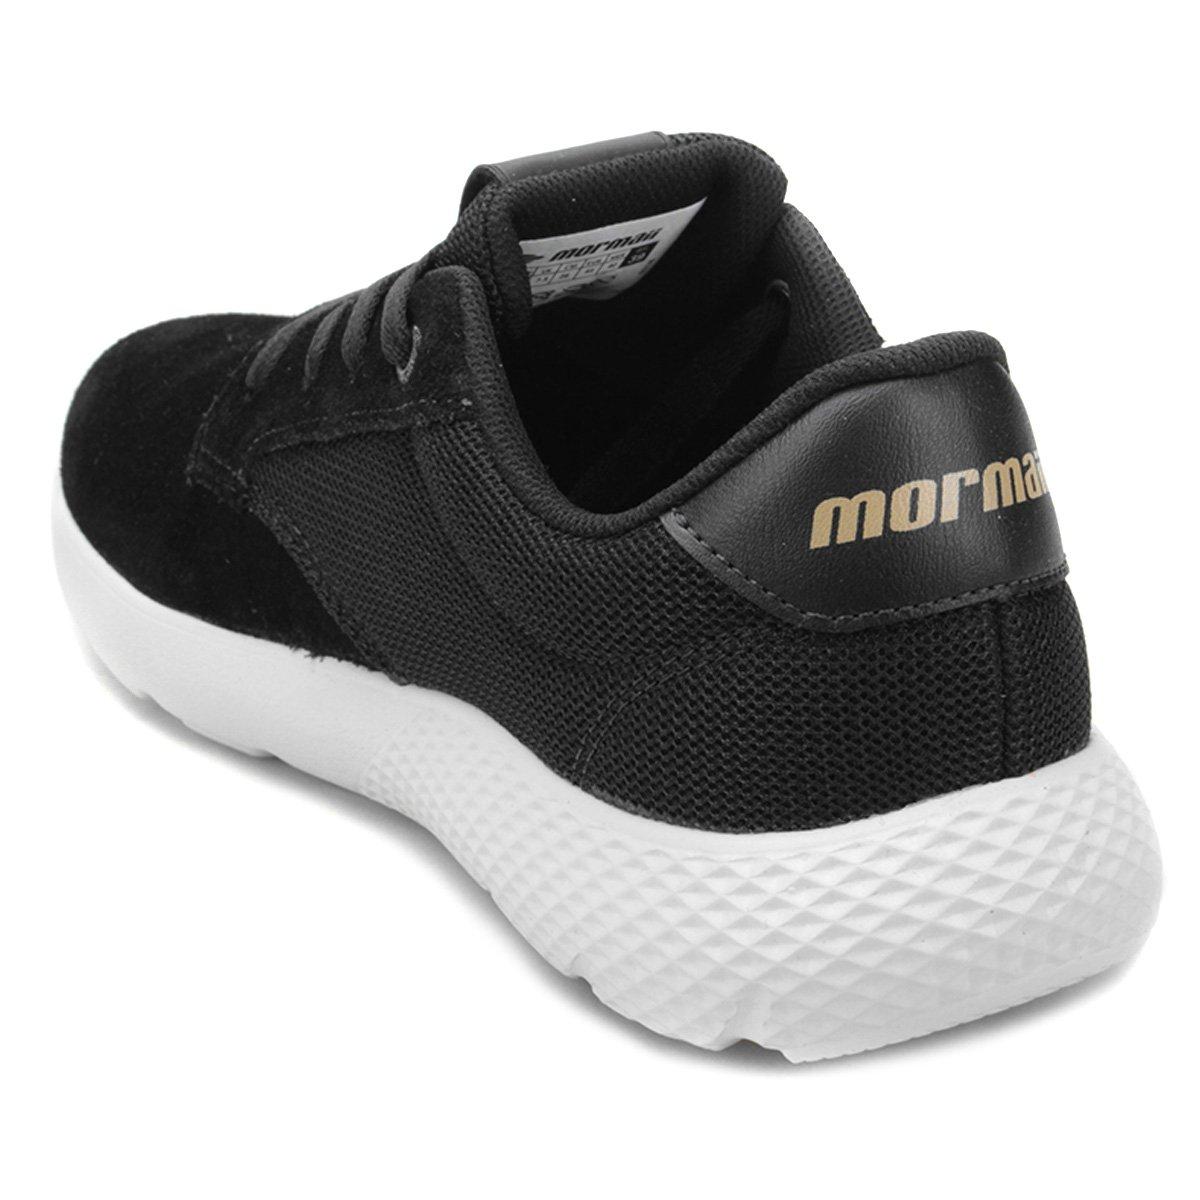 ... Tênis Tênis Mormaii Mormaii Light Preto Masculino zSxdqxwZ ... 673452c43b150